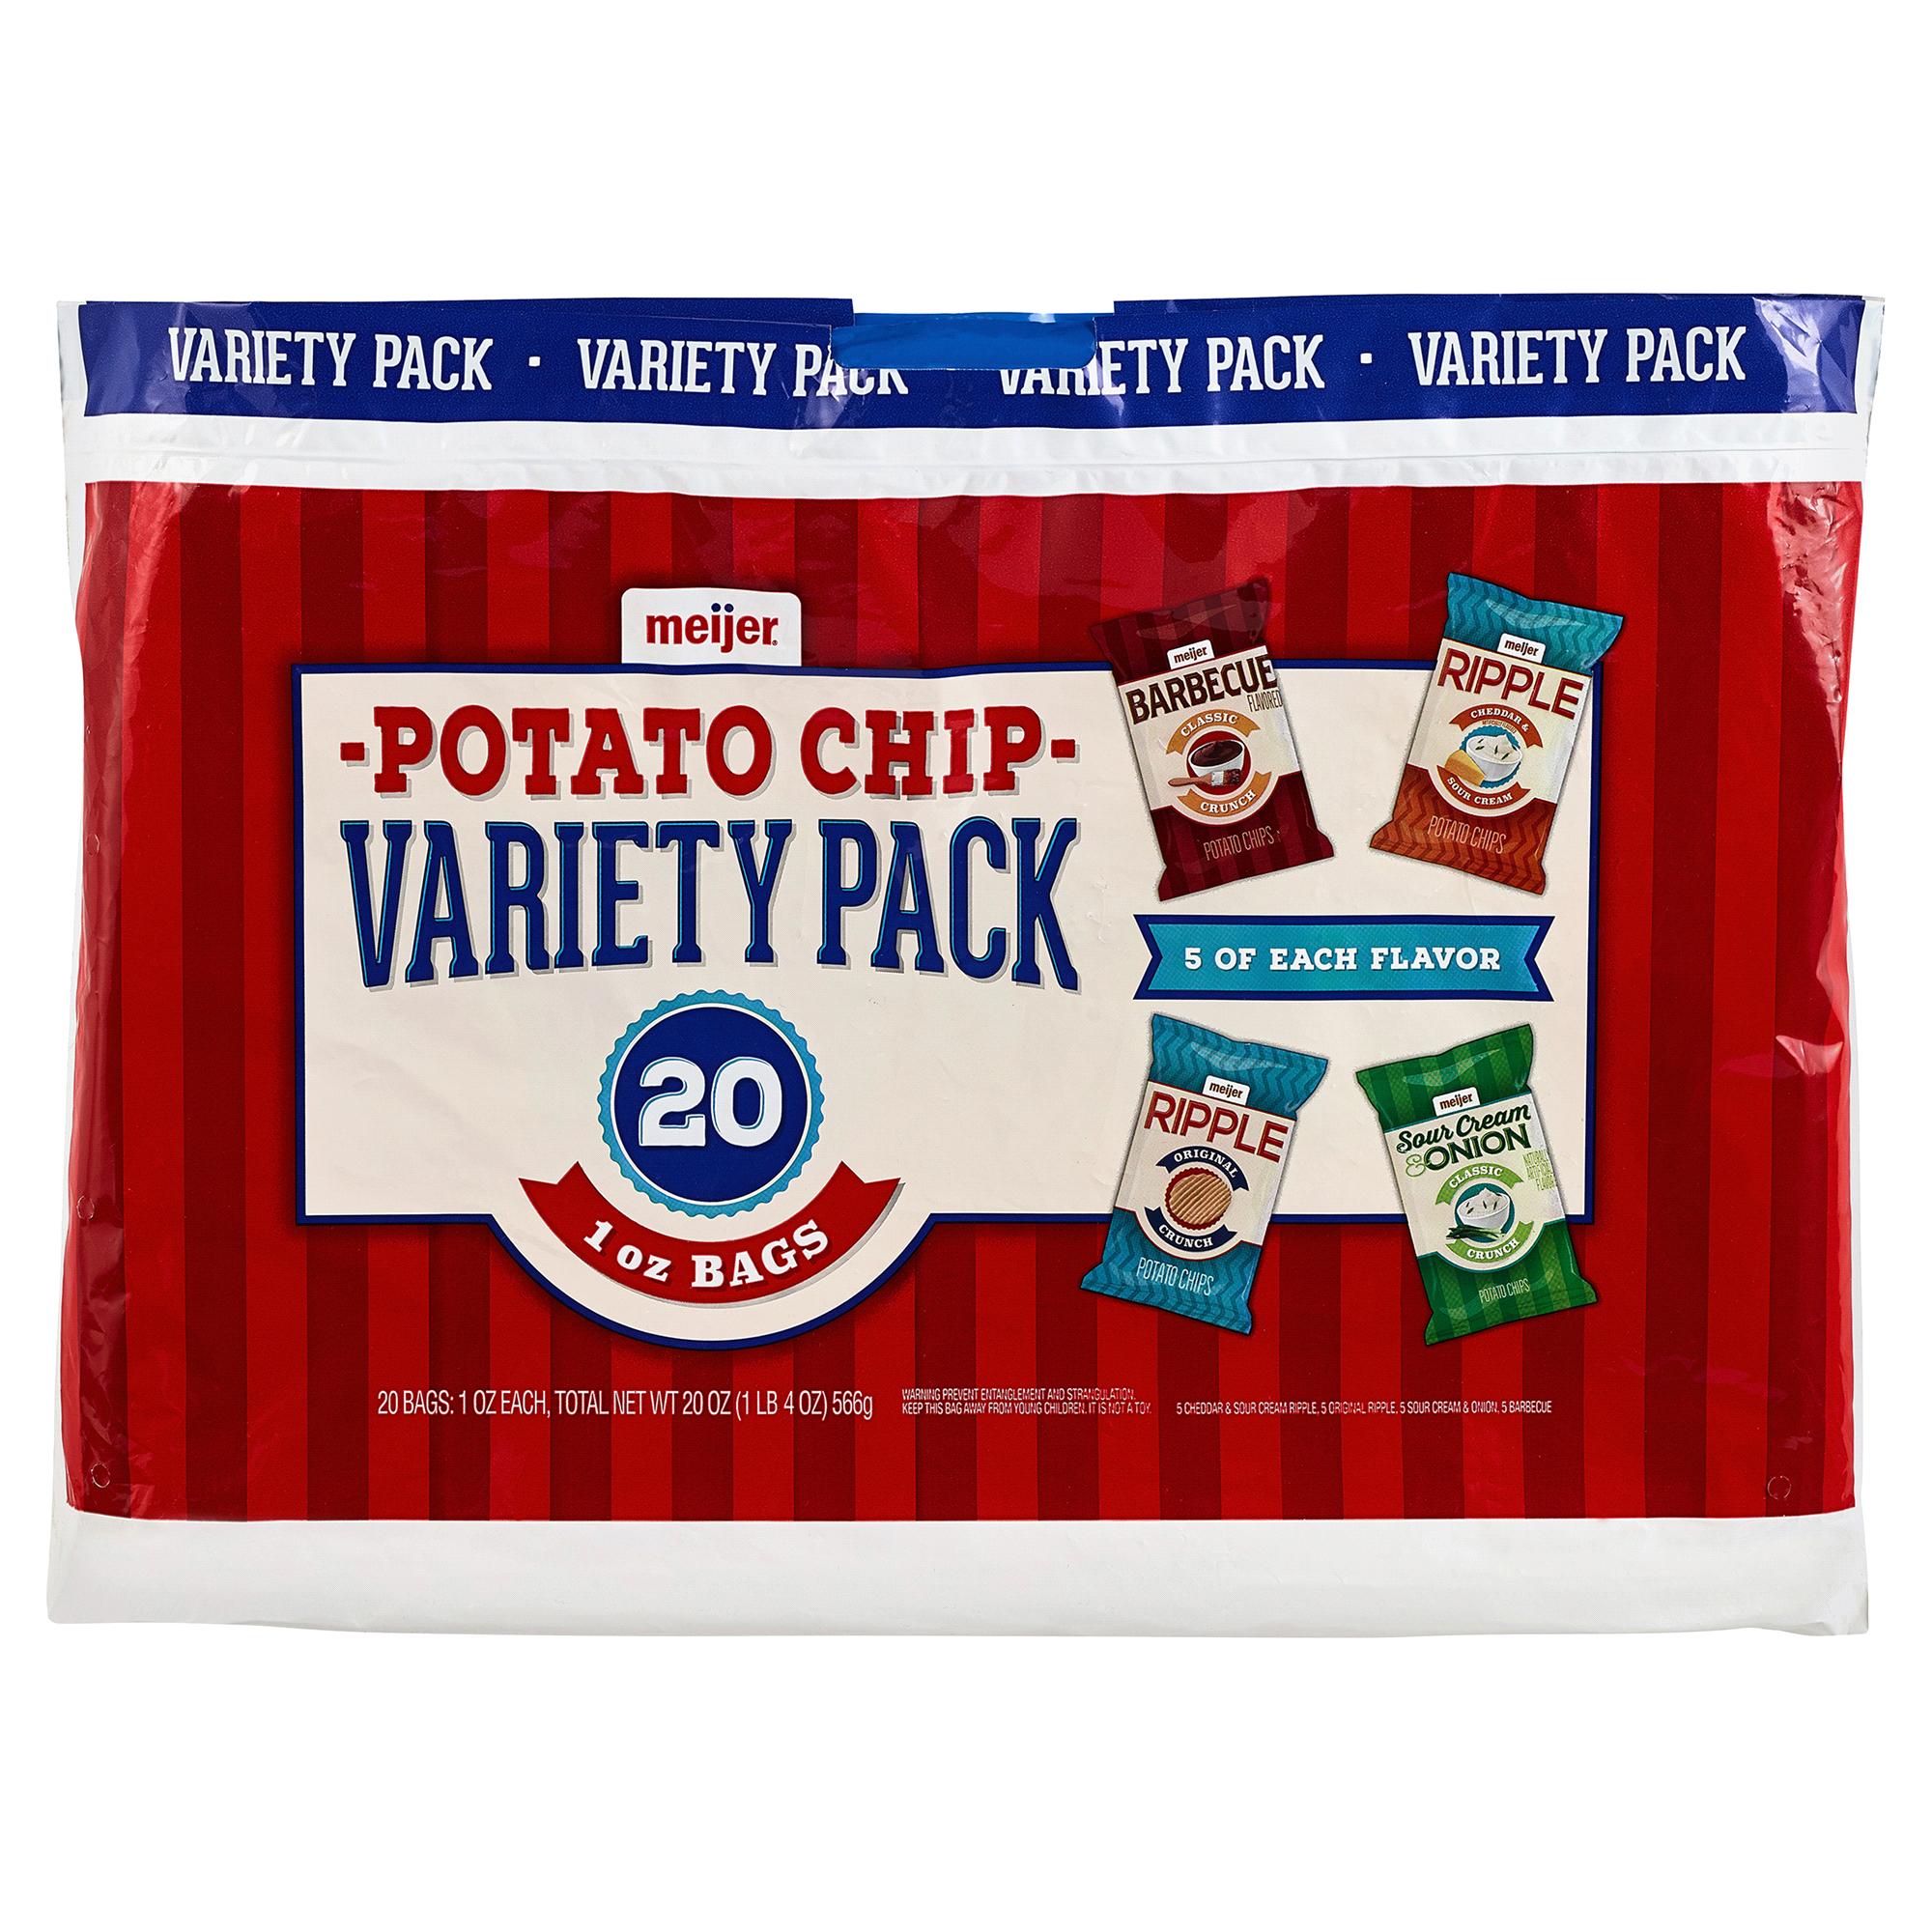 Meijer Potato Chips Variety Pack 20 ct | Meijer.com